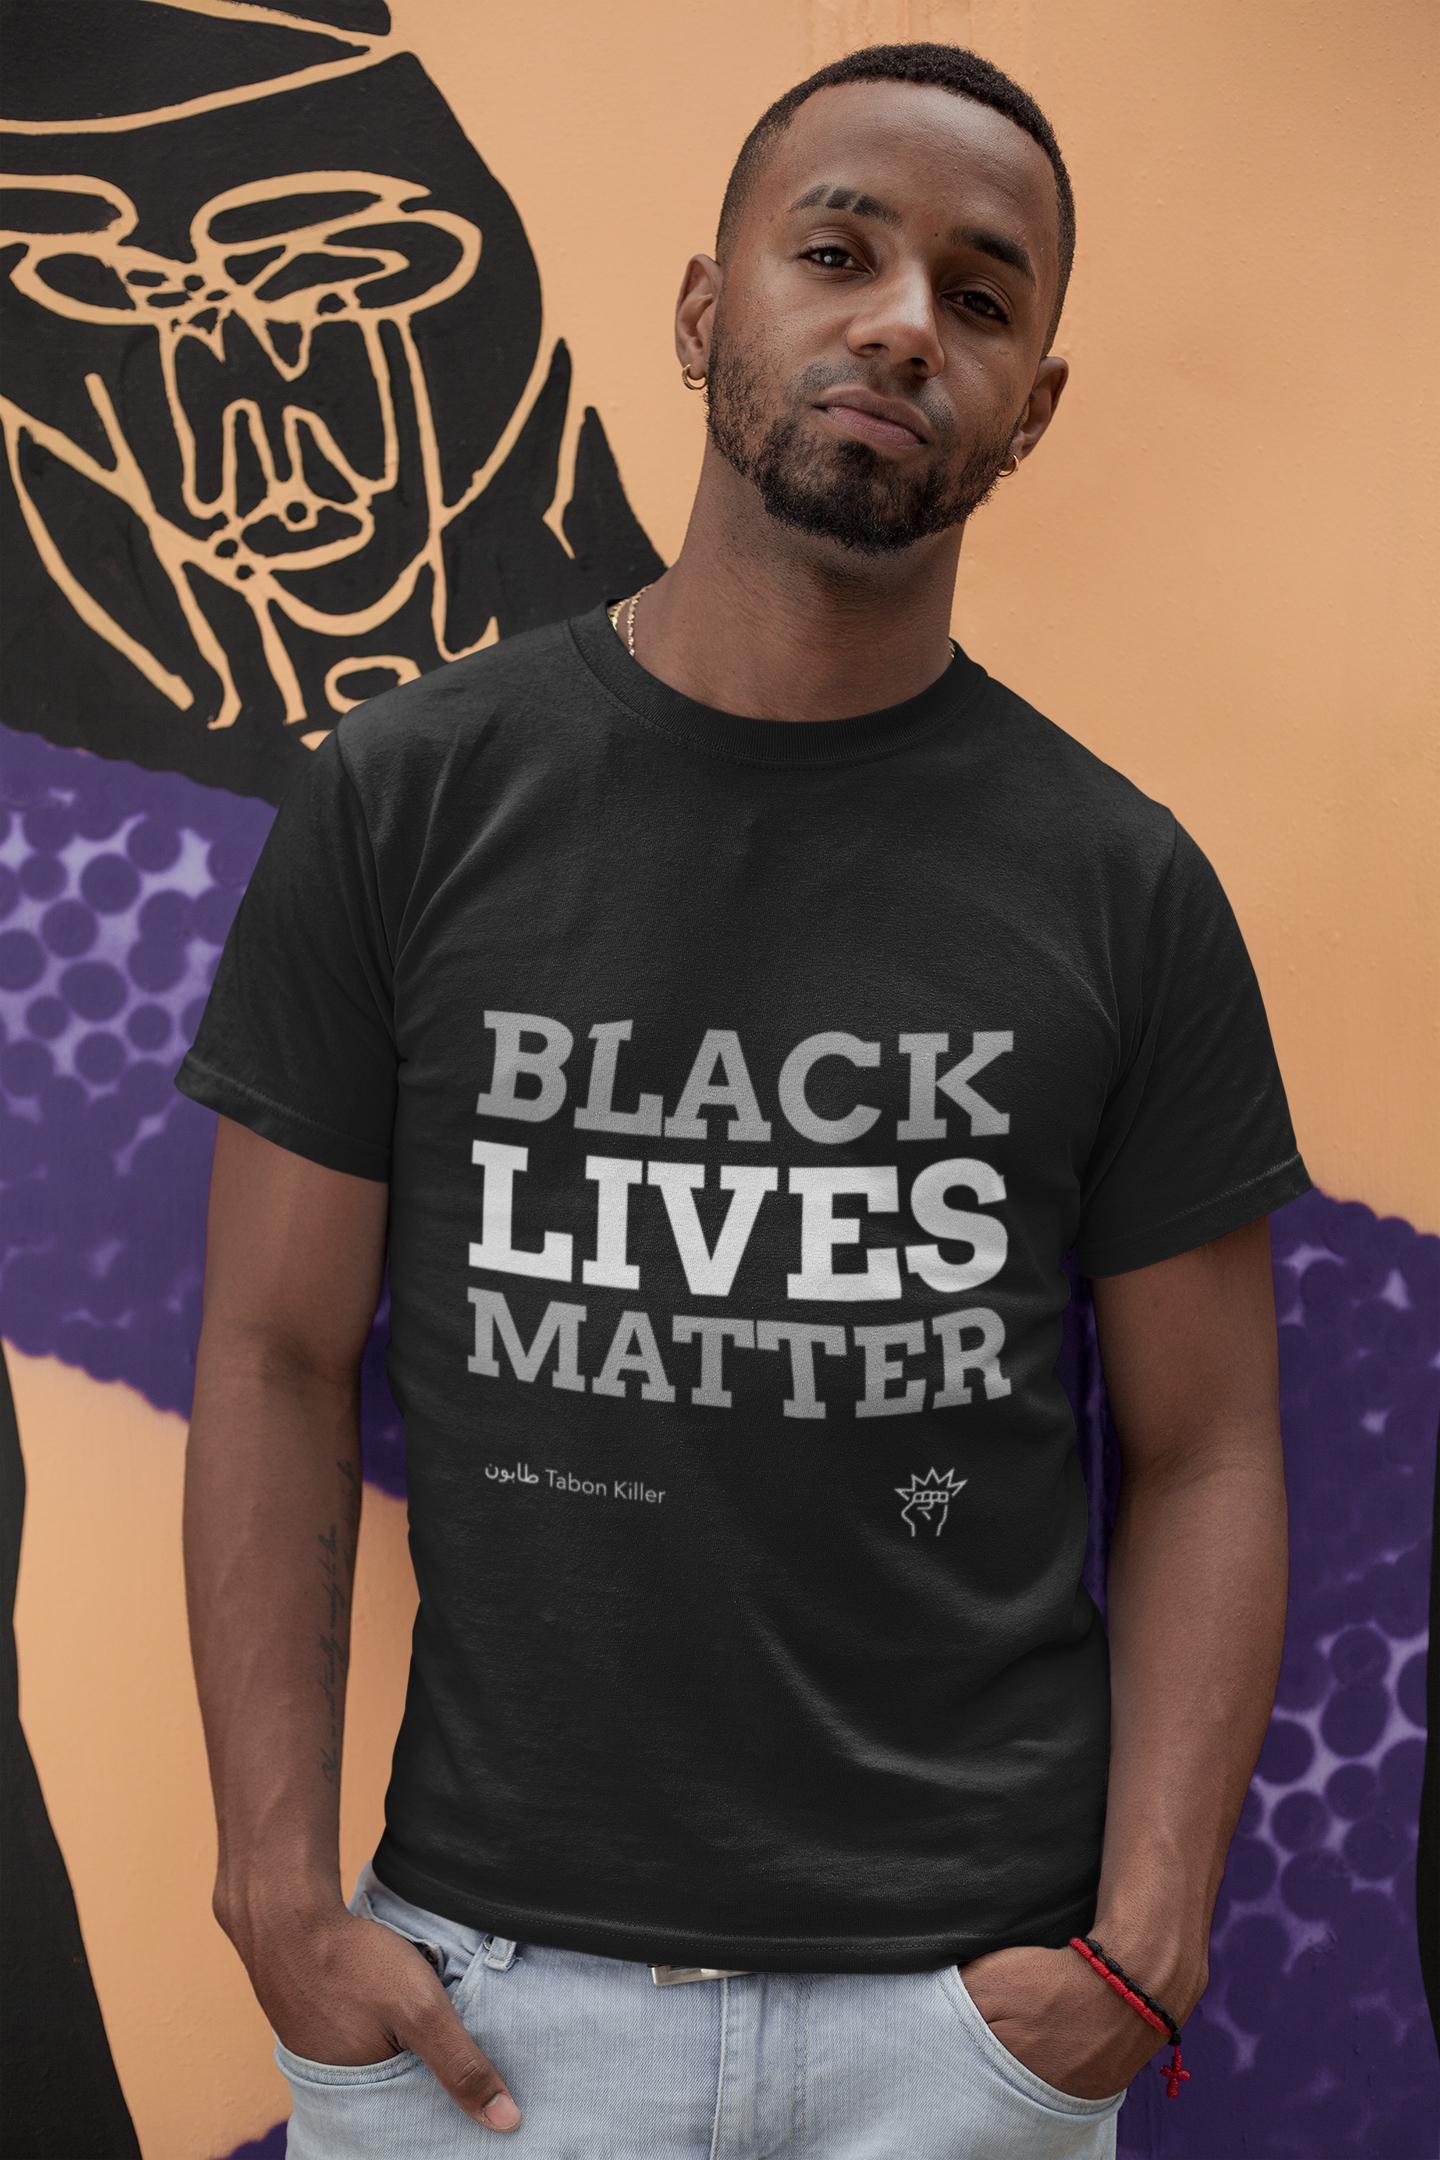 BLM shirt